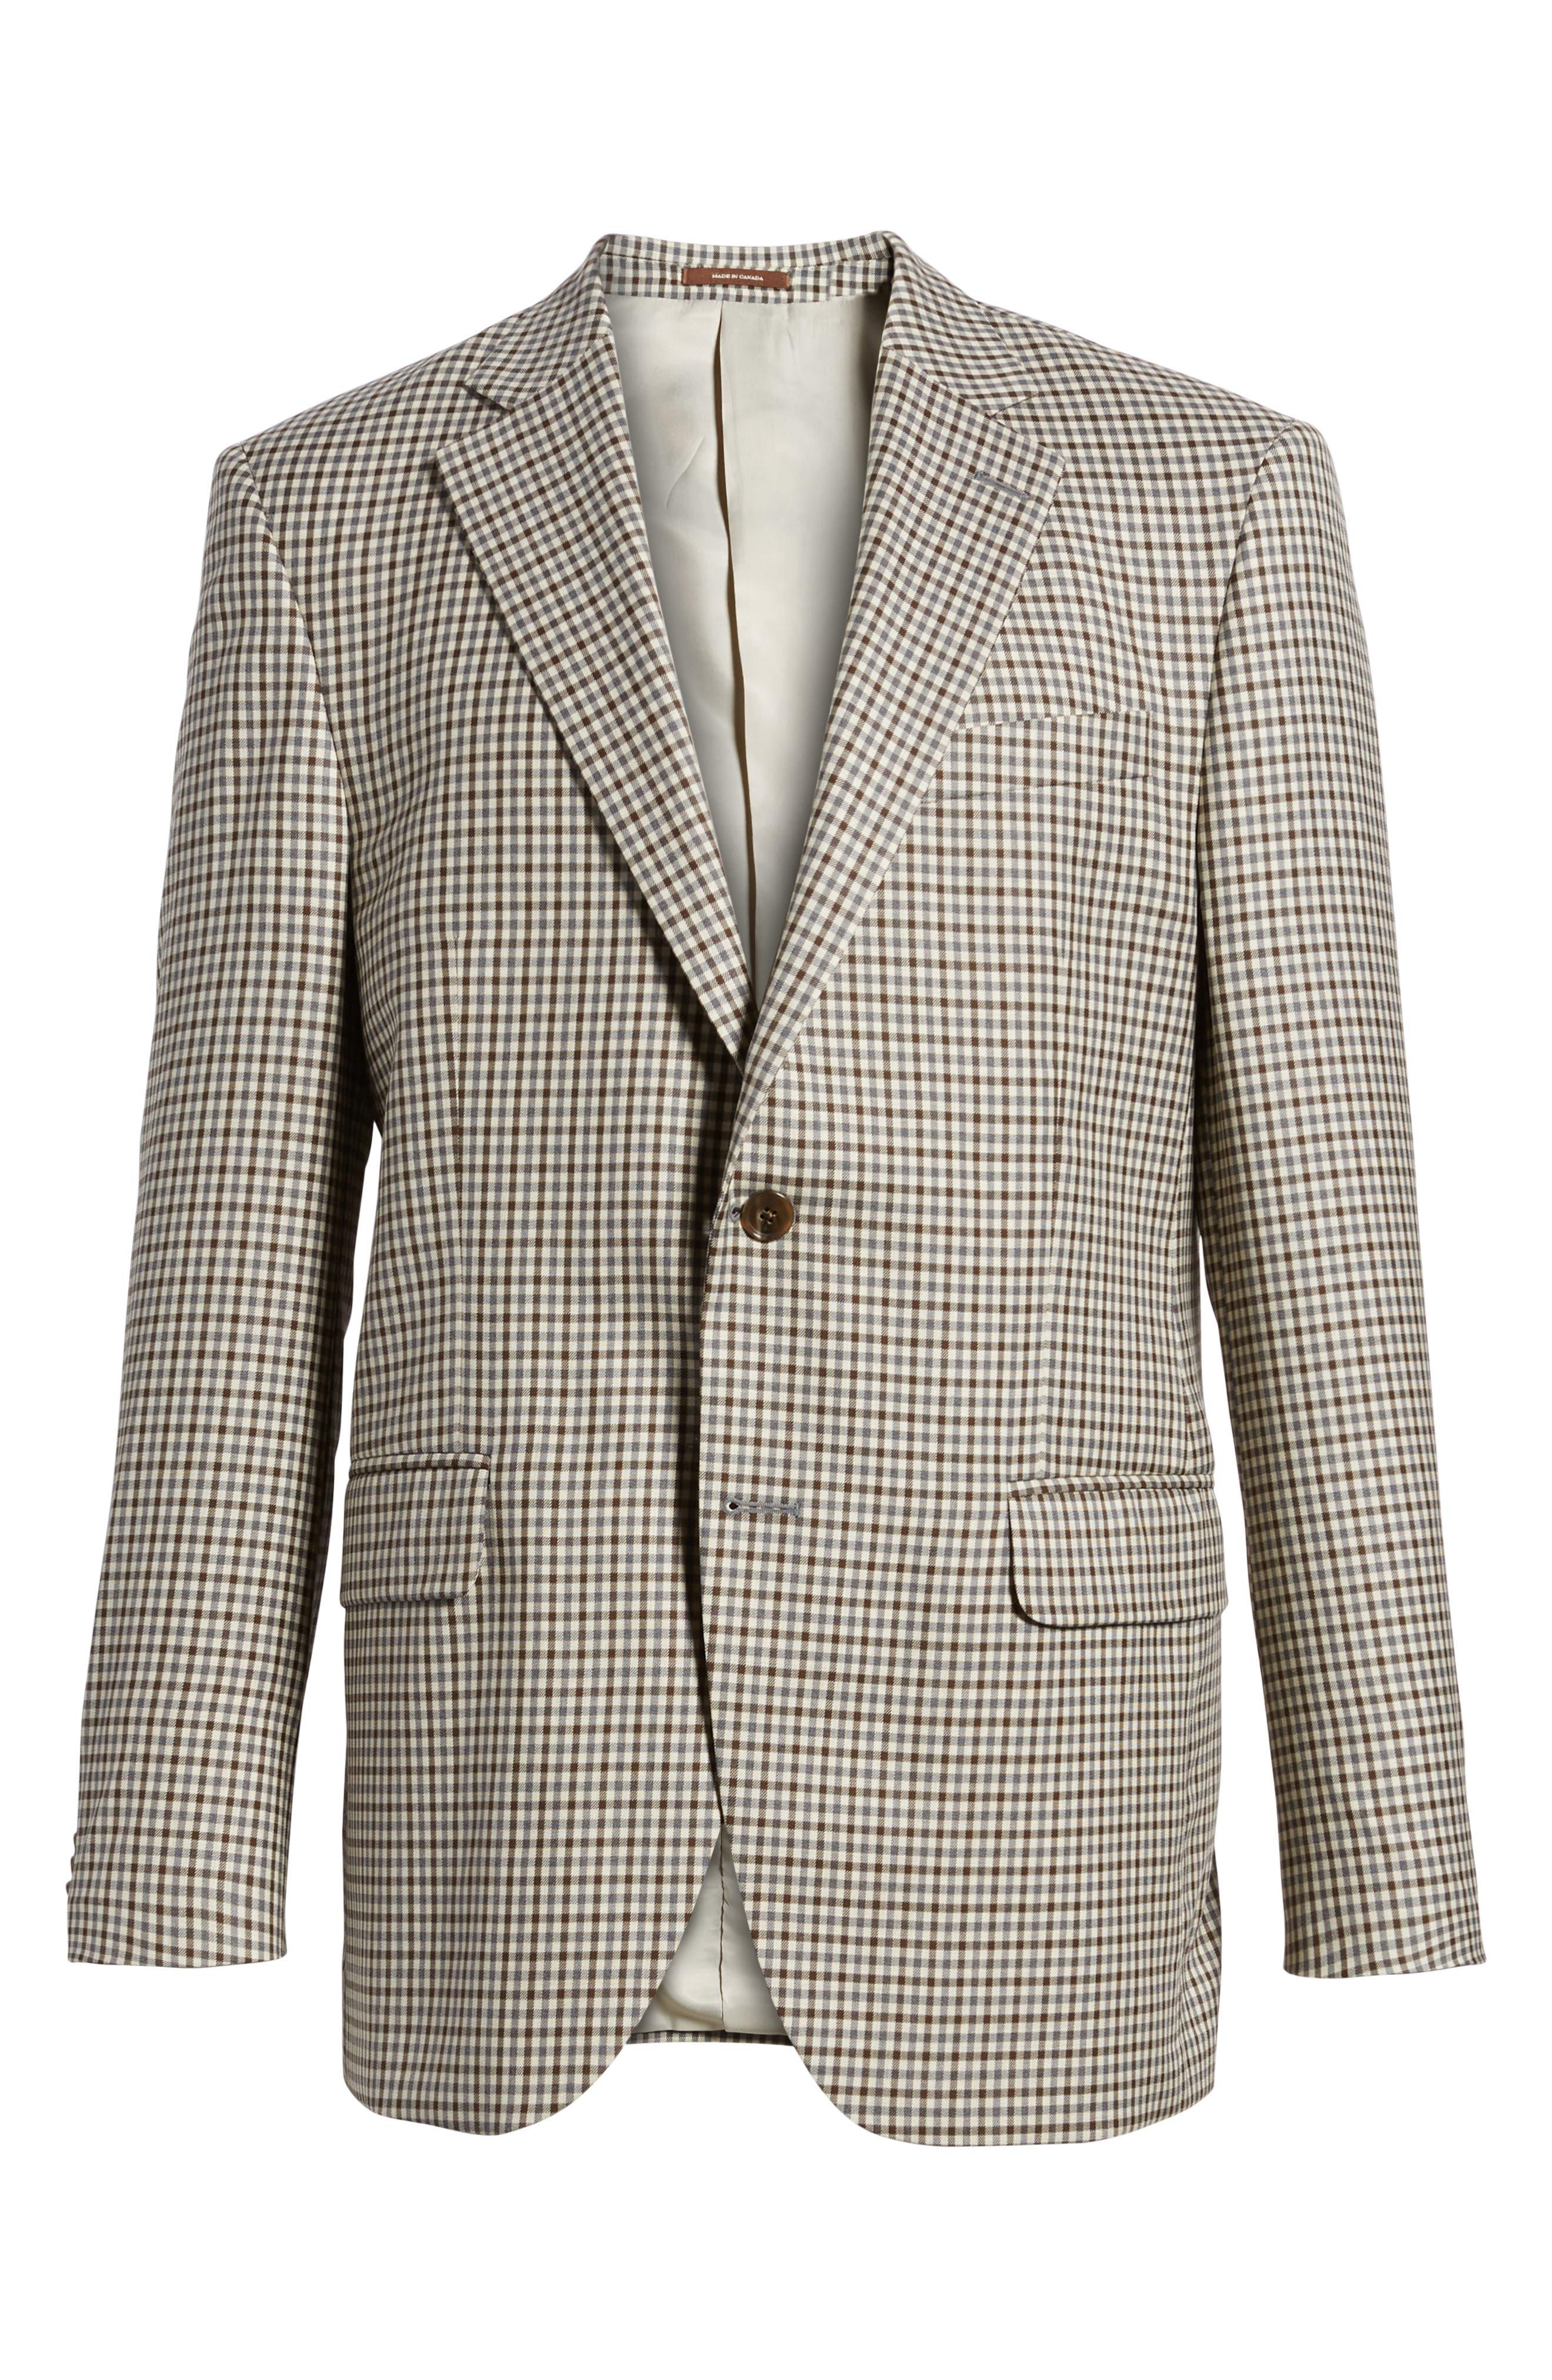 Classic Fit Check Wool Sport Coat,                             Alternate thumbnail 6, color,                             Tan/Grey